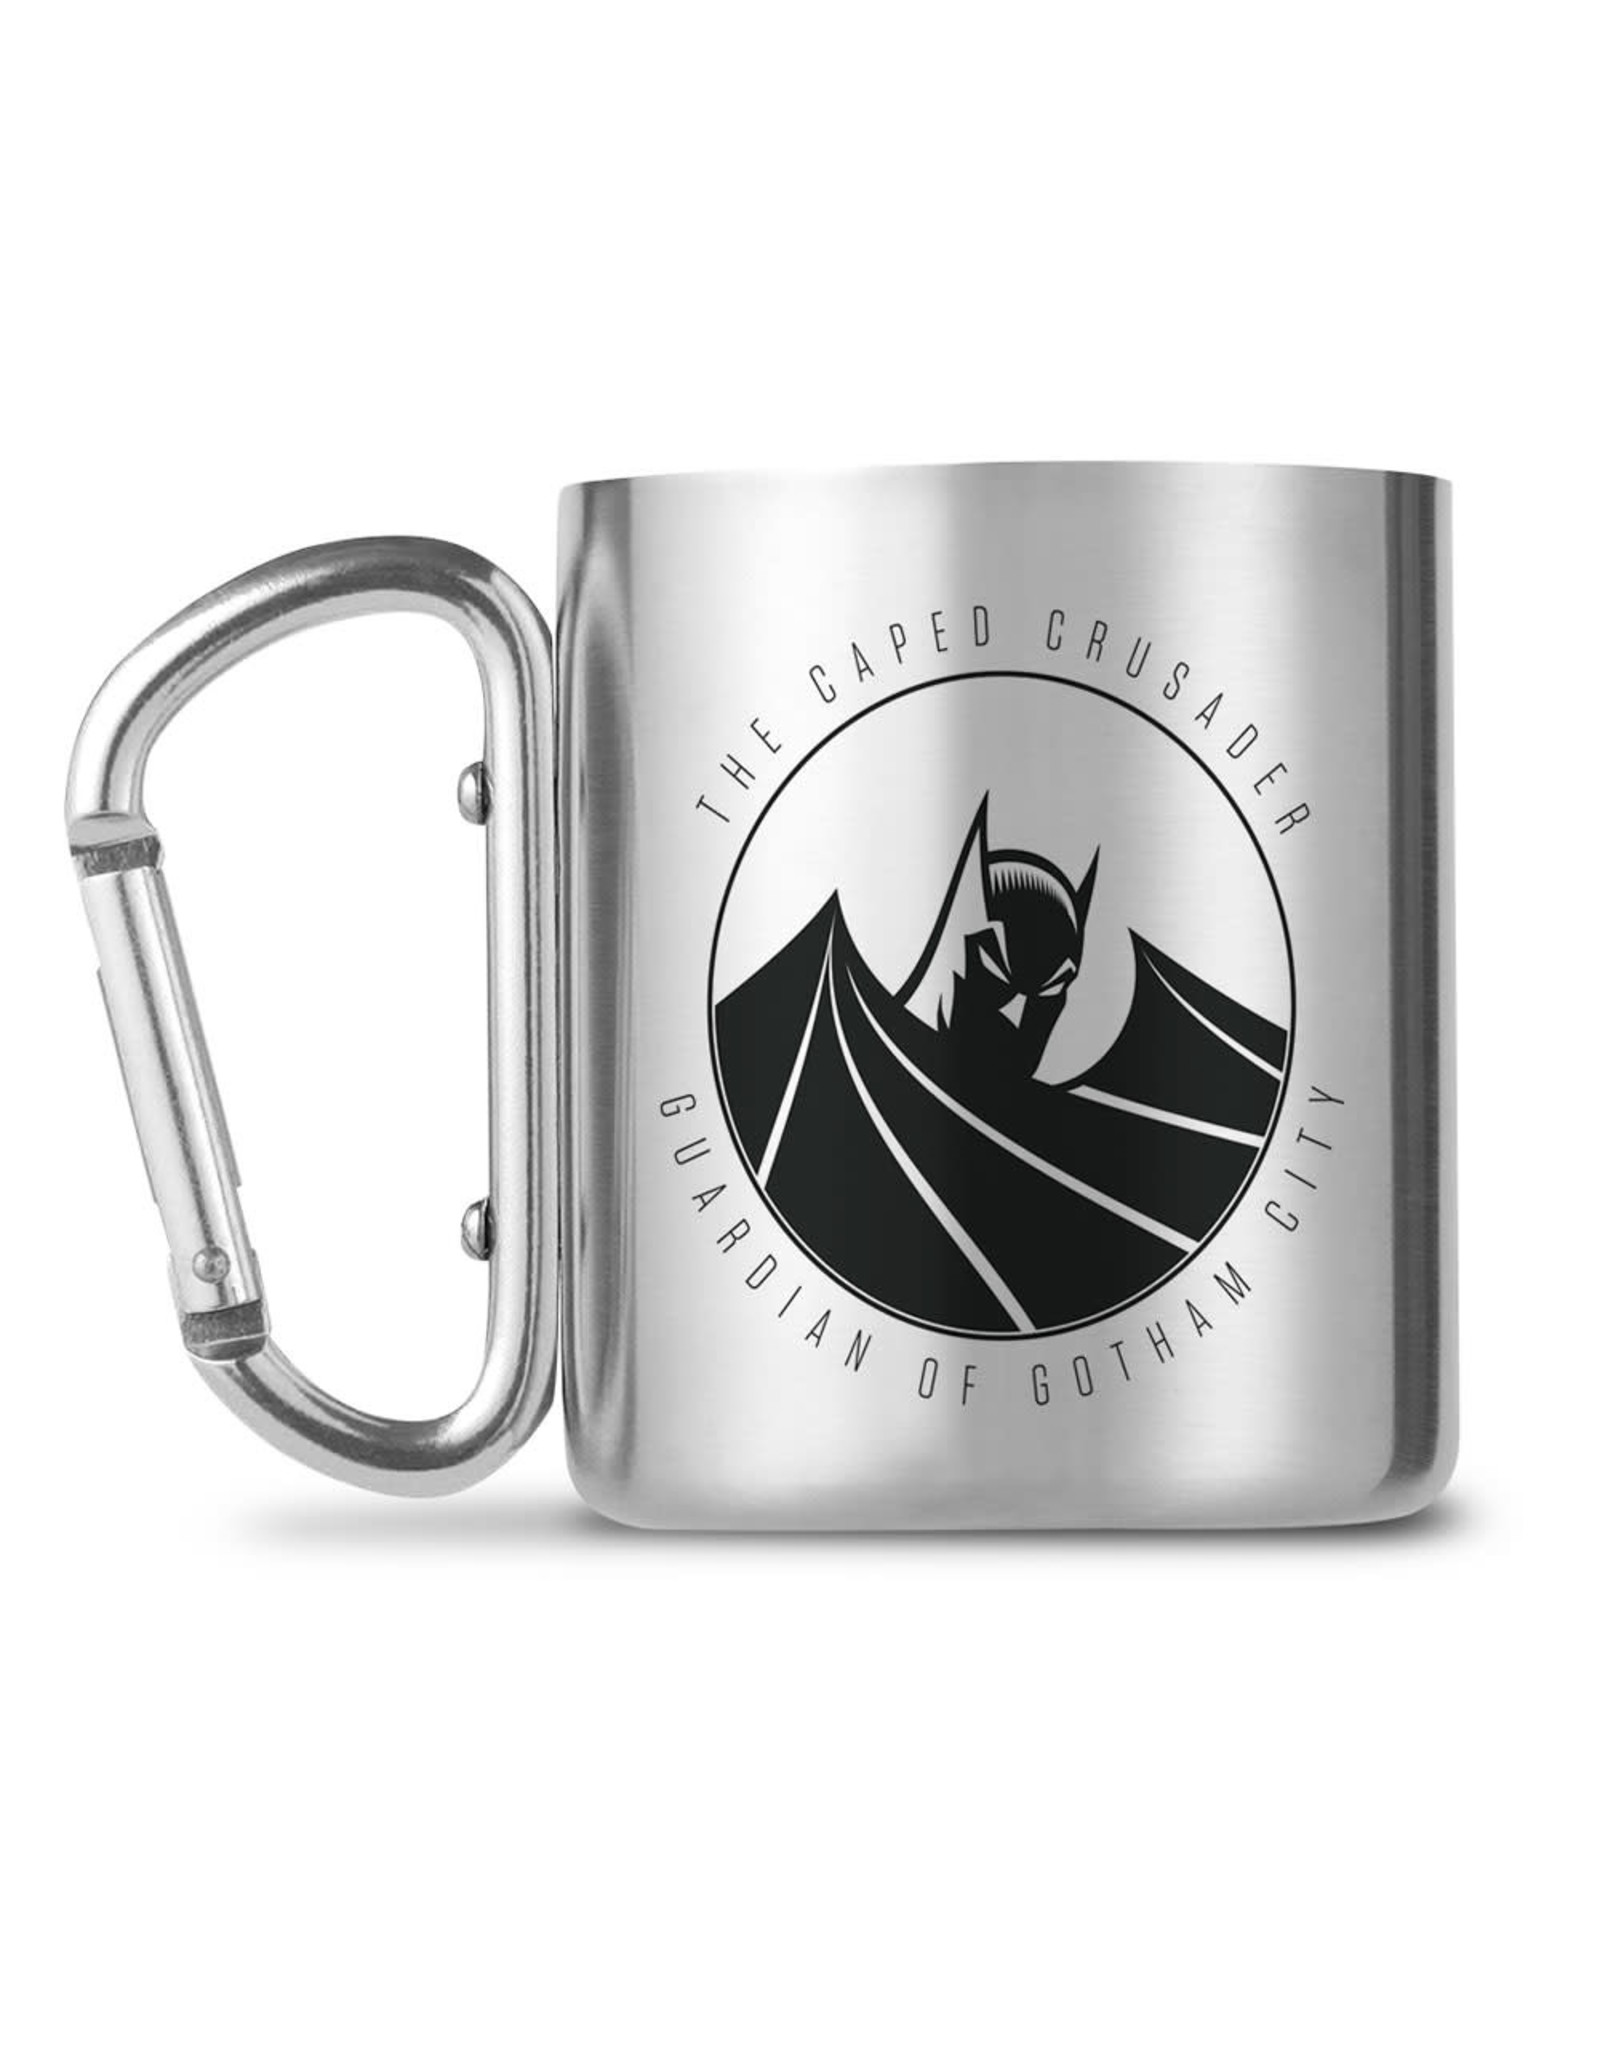 GBEye BATMAN Carabiner Mug 240ml - Caped Crusader